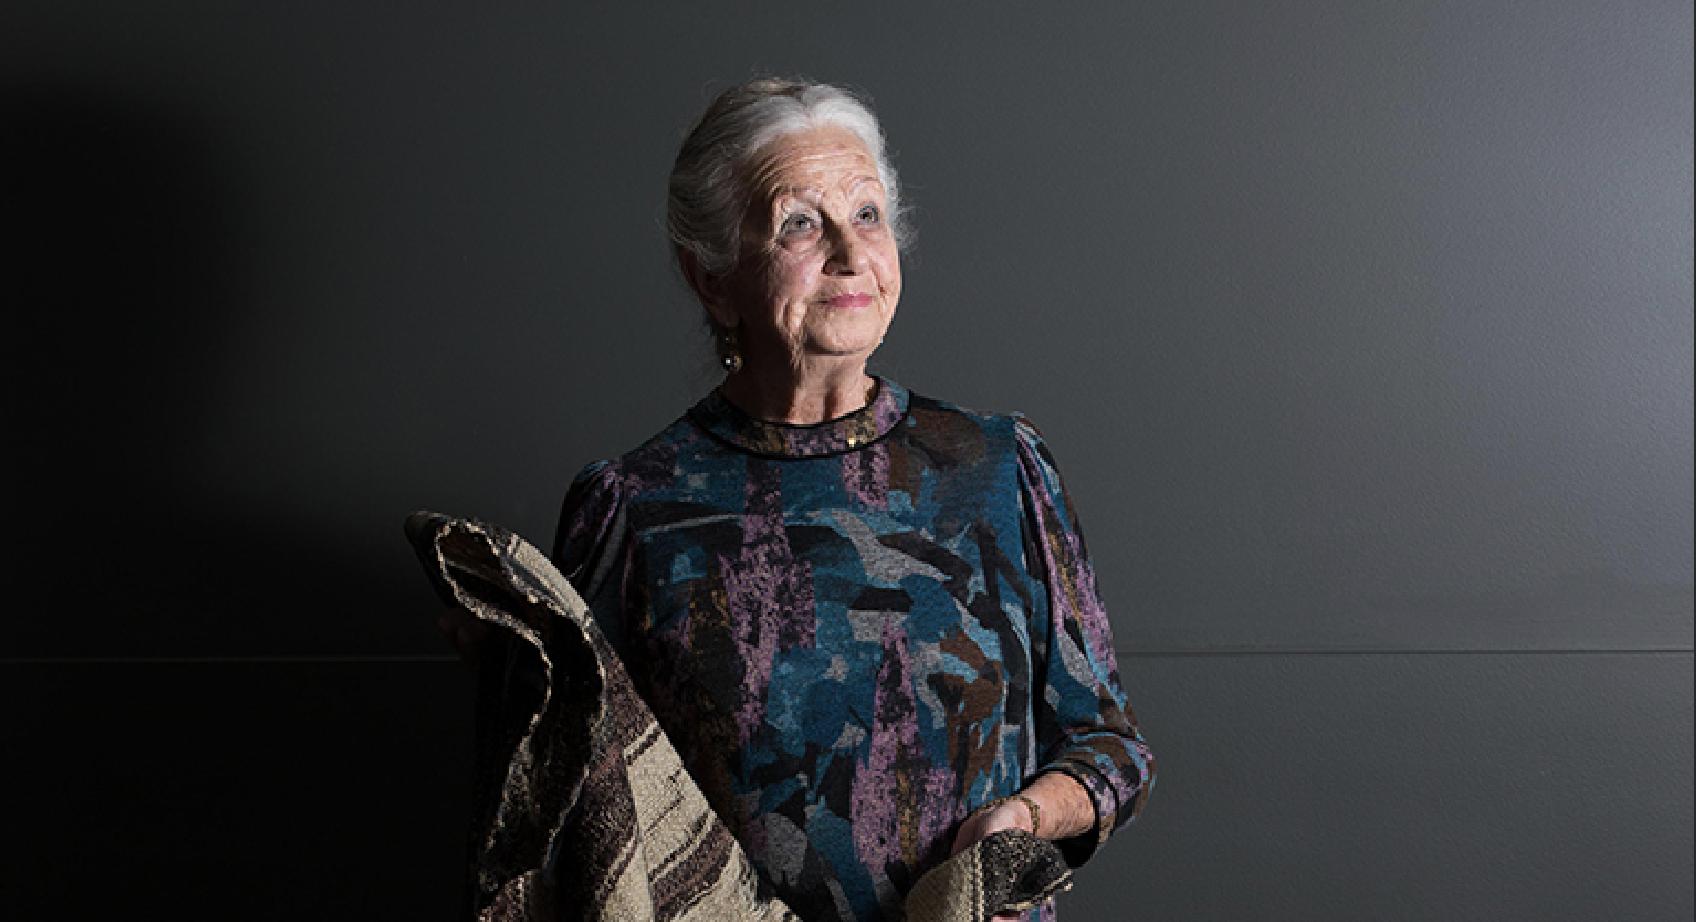 Photograph of Holocaust survivor Olga Horak looking upwards